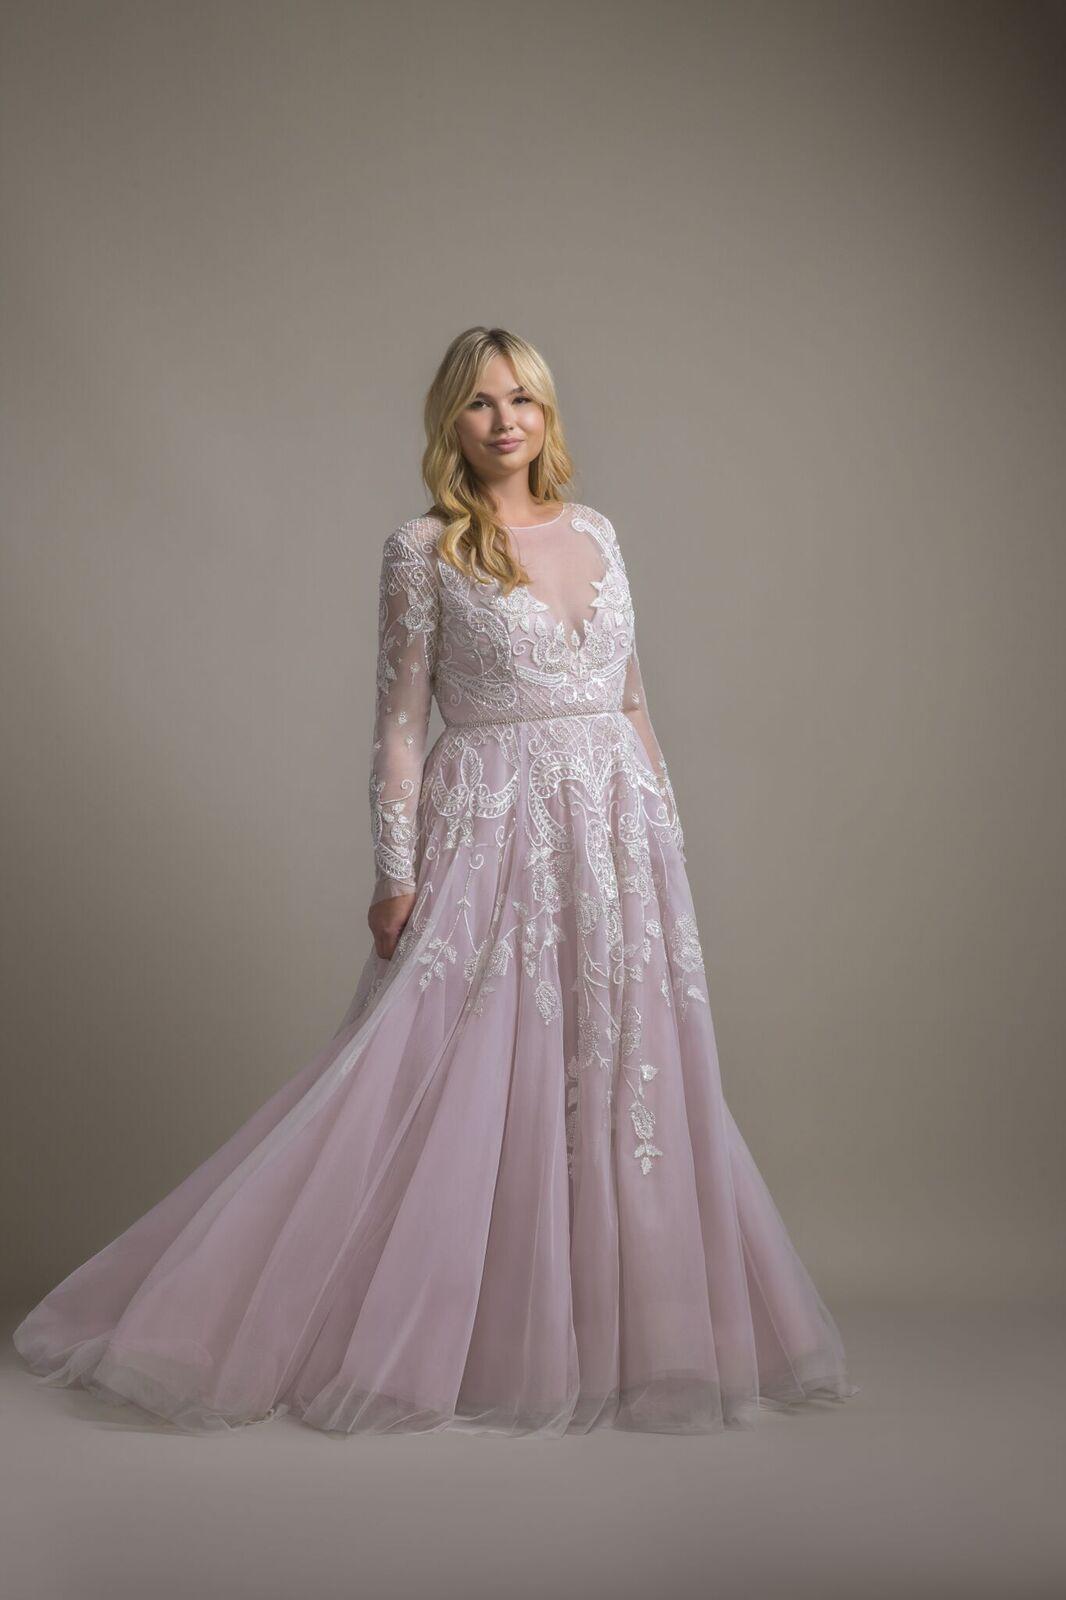 Hayley Hayley Paige Bridal Gown Amethyst Long Sleeve Rococo Bridal Gow Plus Wedding Dresses Plus Size Bridal Dresses Plus Size Wedding Dresses With Sleeves [ 1600 x 1066 Pixel ]